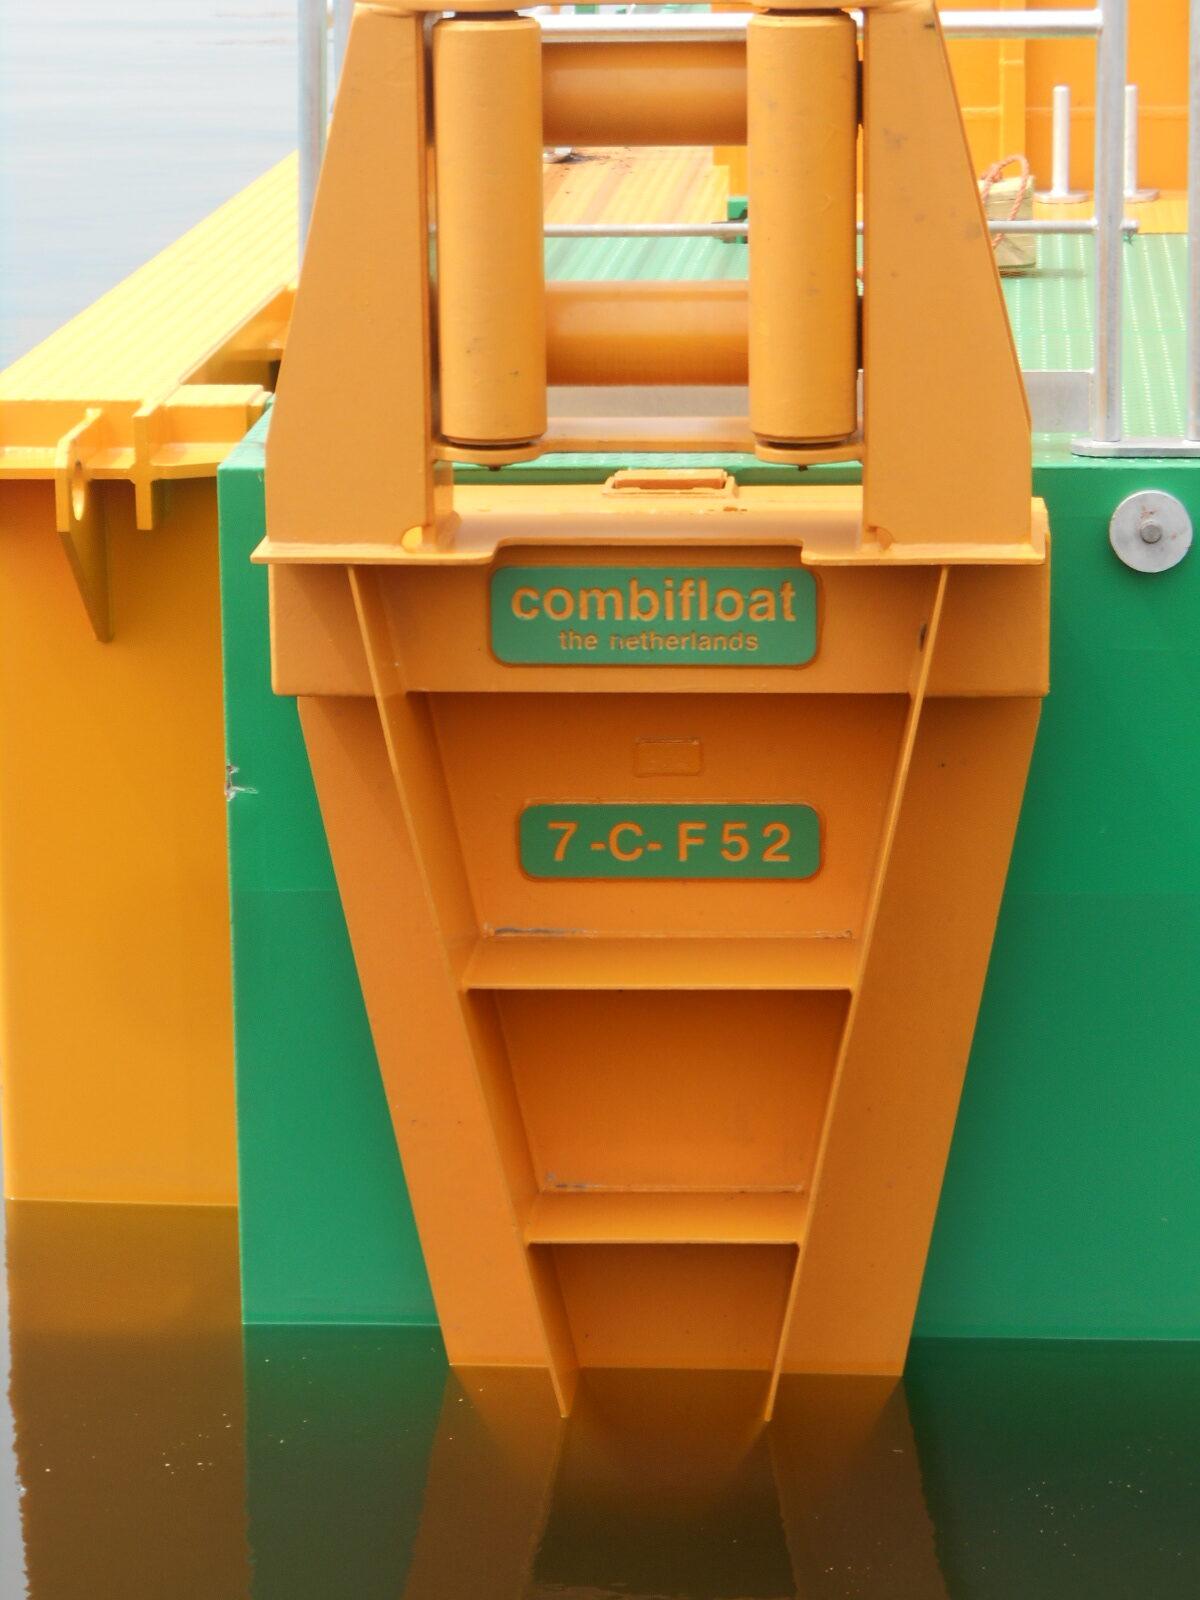 Combifloat accessories fairlead